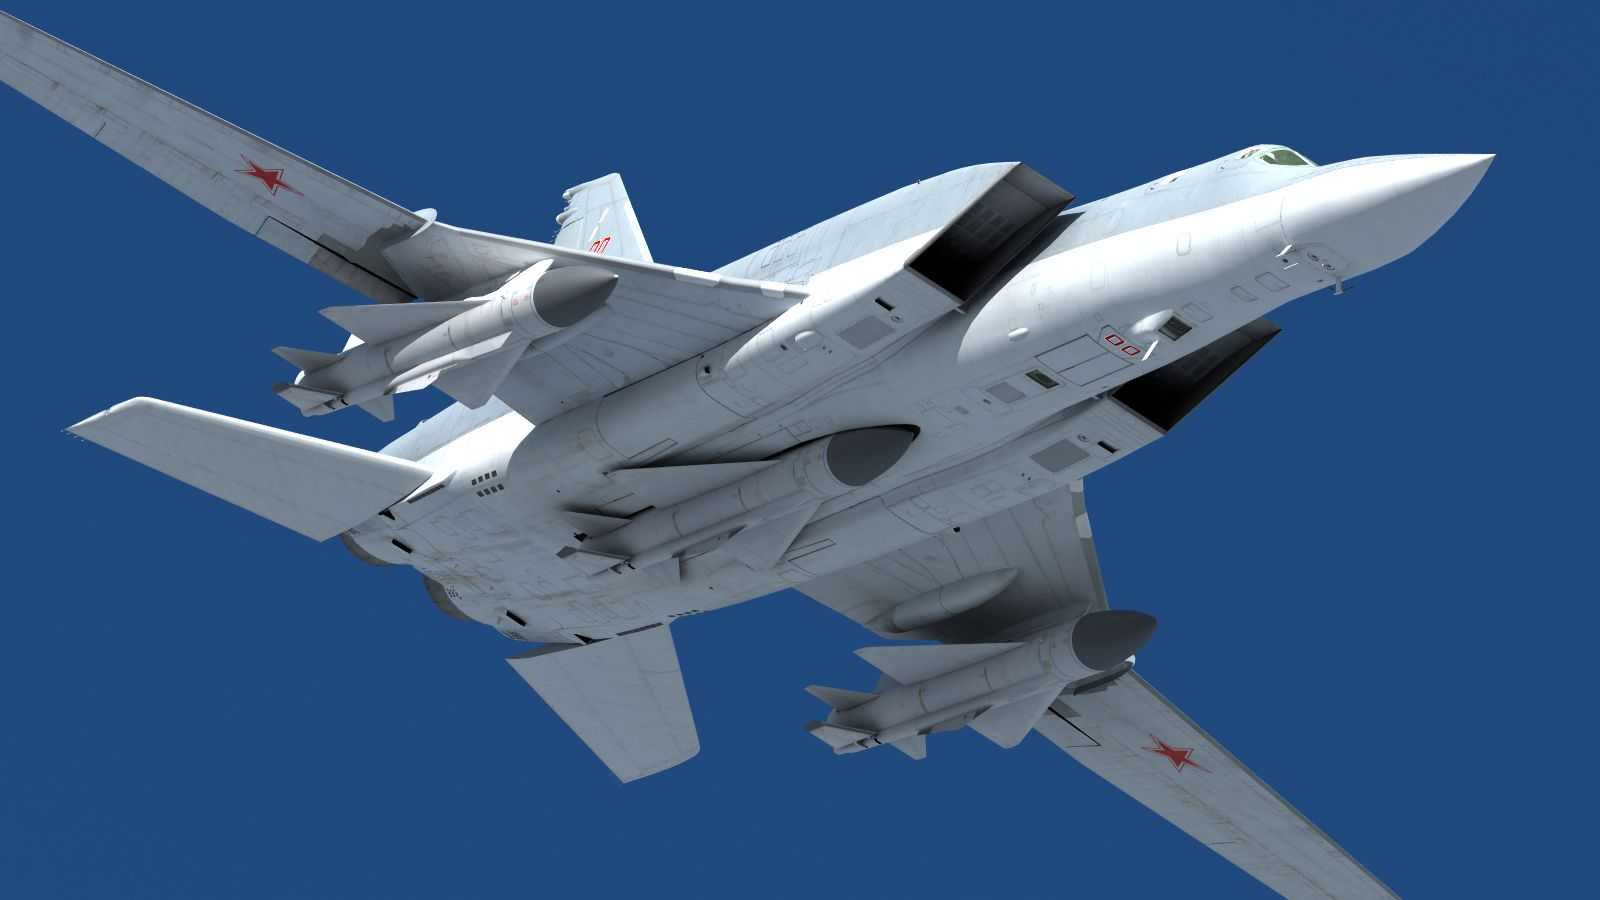 TU-22M-Backfire-with-Kh-22-missiles.jpg